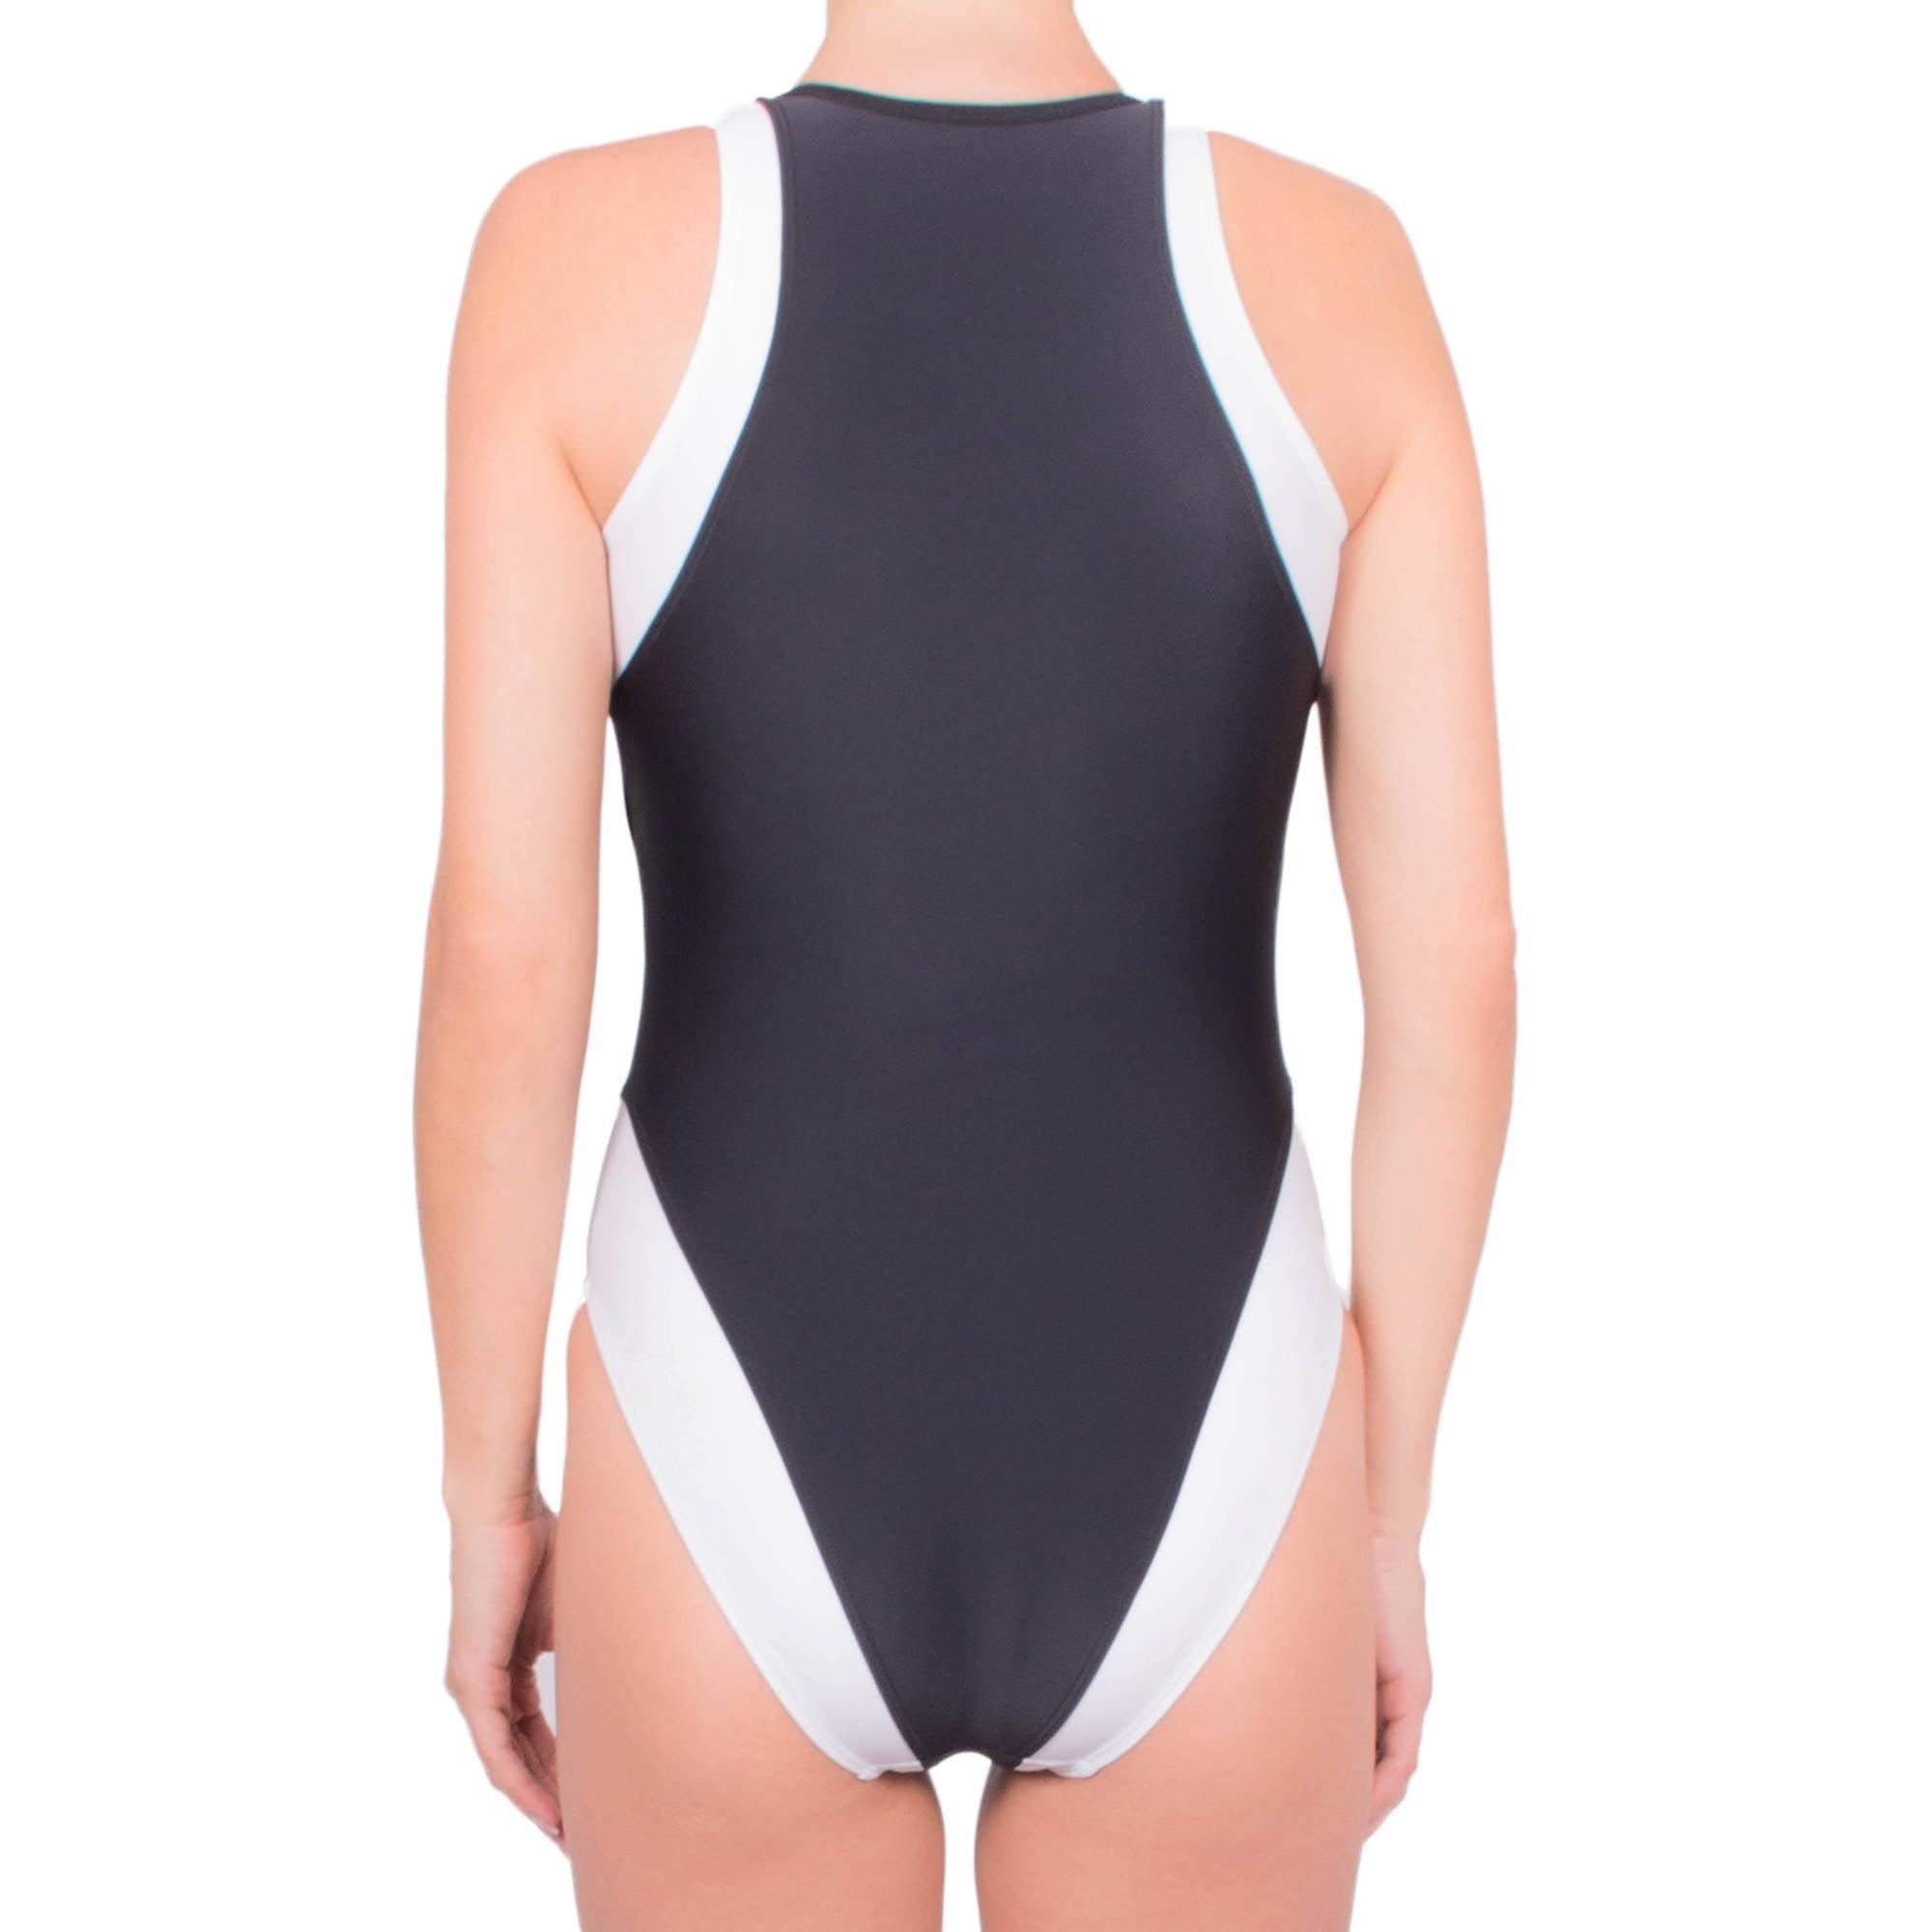 b5279abd5c7 Donatella Sport - Women's Neoprene High-Cut One-Piece Swimsuit With Chunky  Zipper - Walmart.com